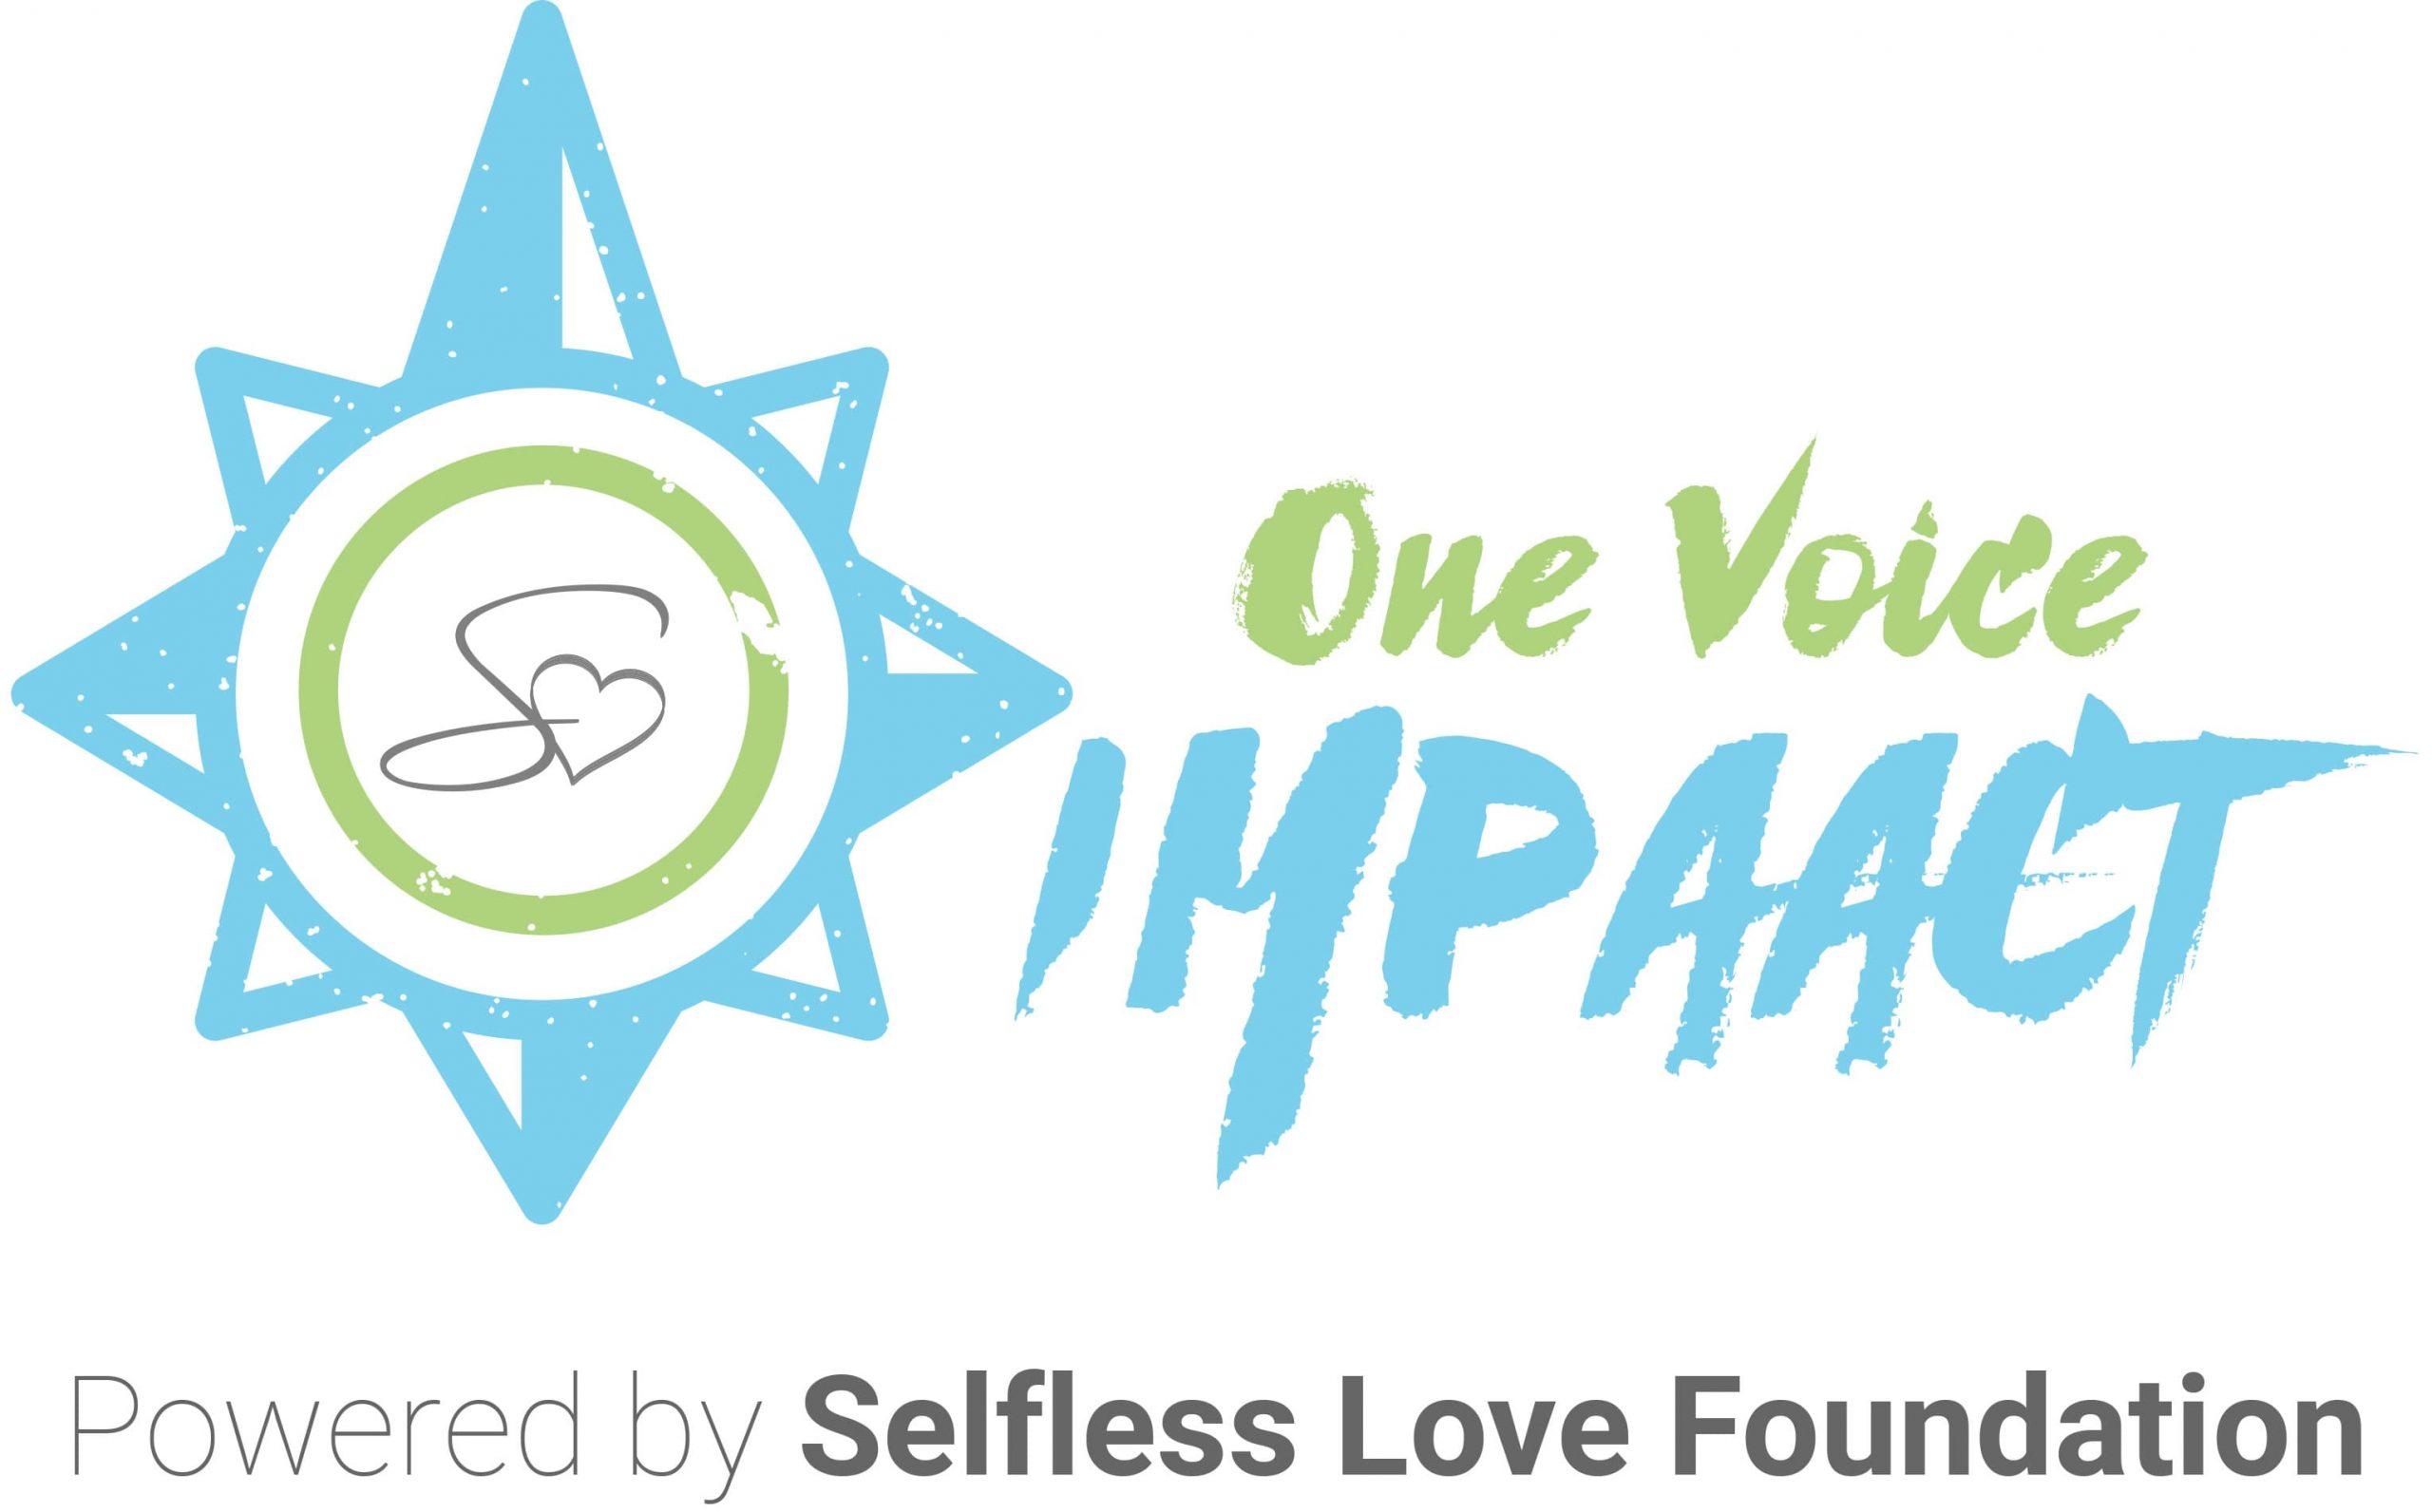 OVI-one-voice-impaact-selfless-love-foundation